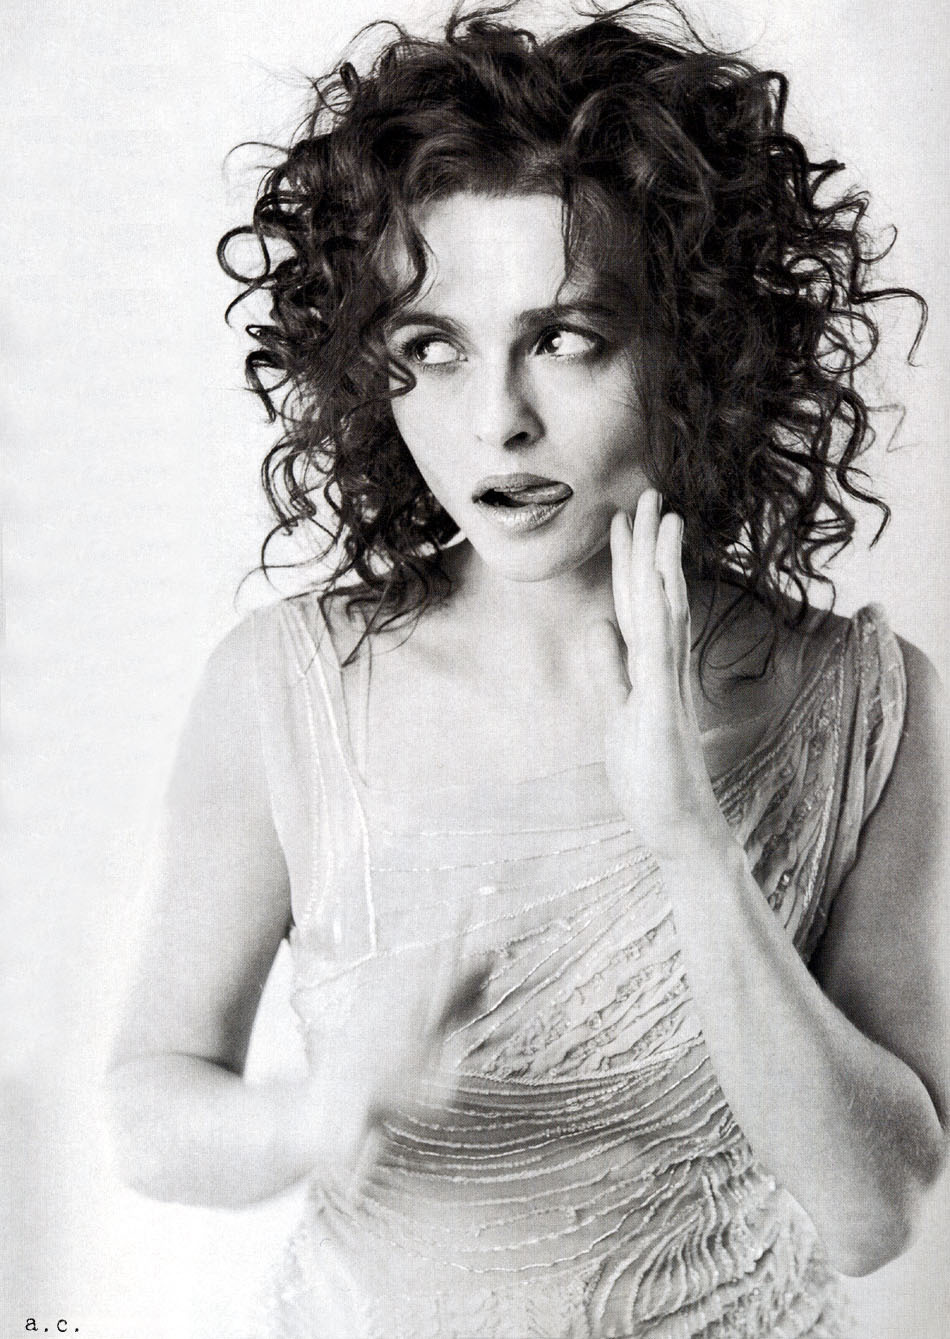 Helena - Helena Bonham Carter Photo (21405563) - Fanpop